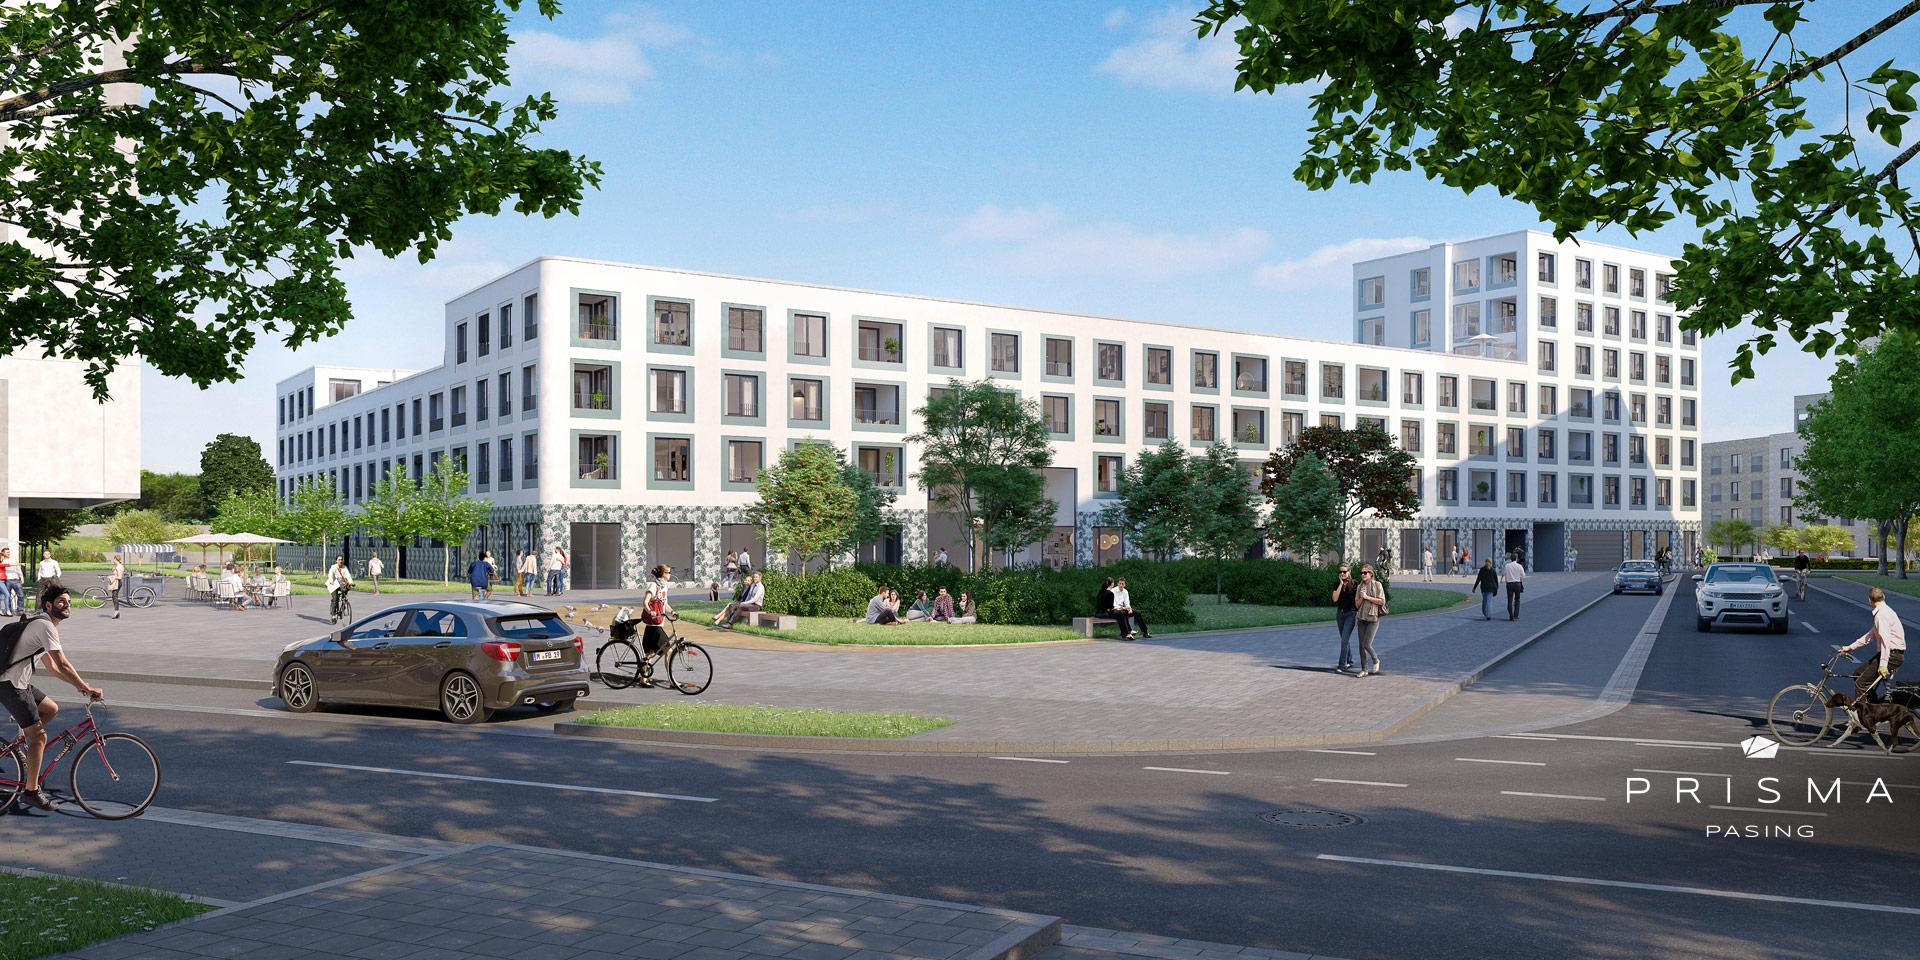 Property Munich: Prisma Pasing